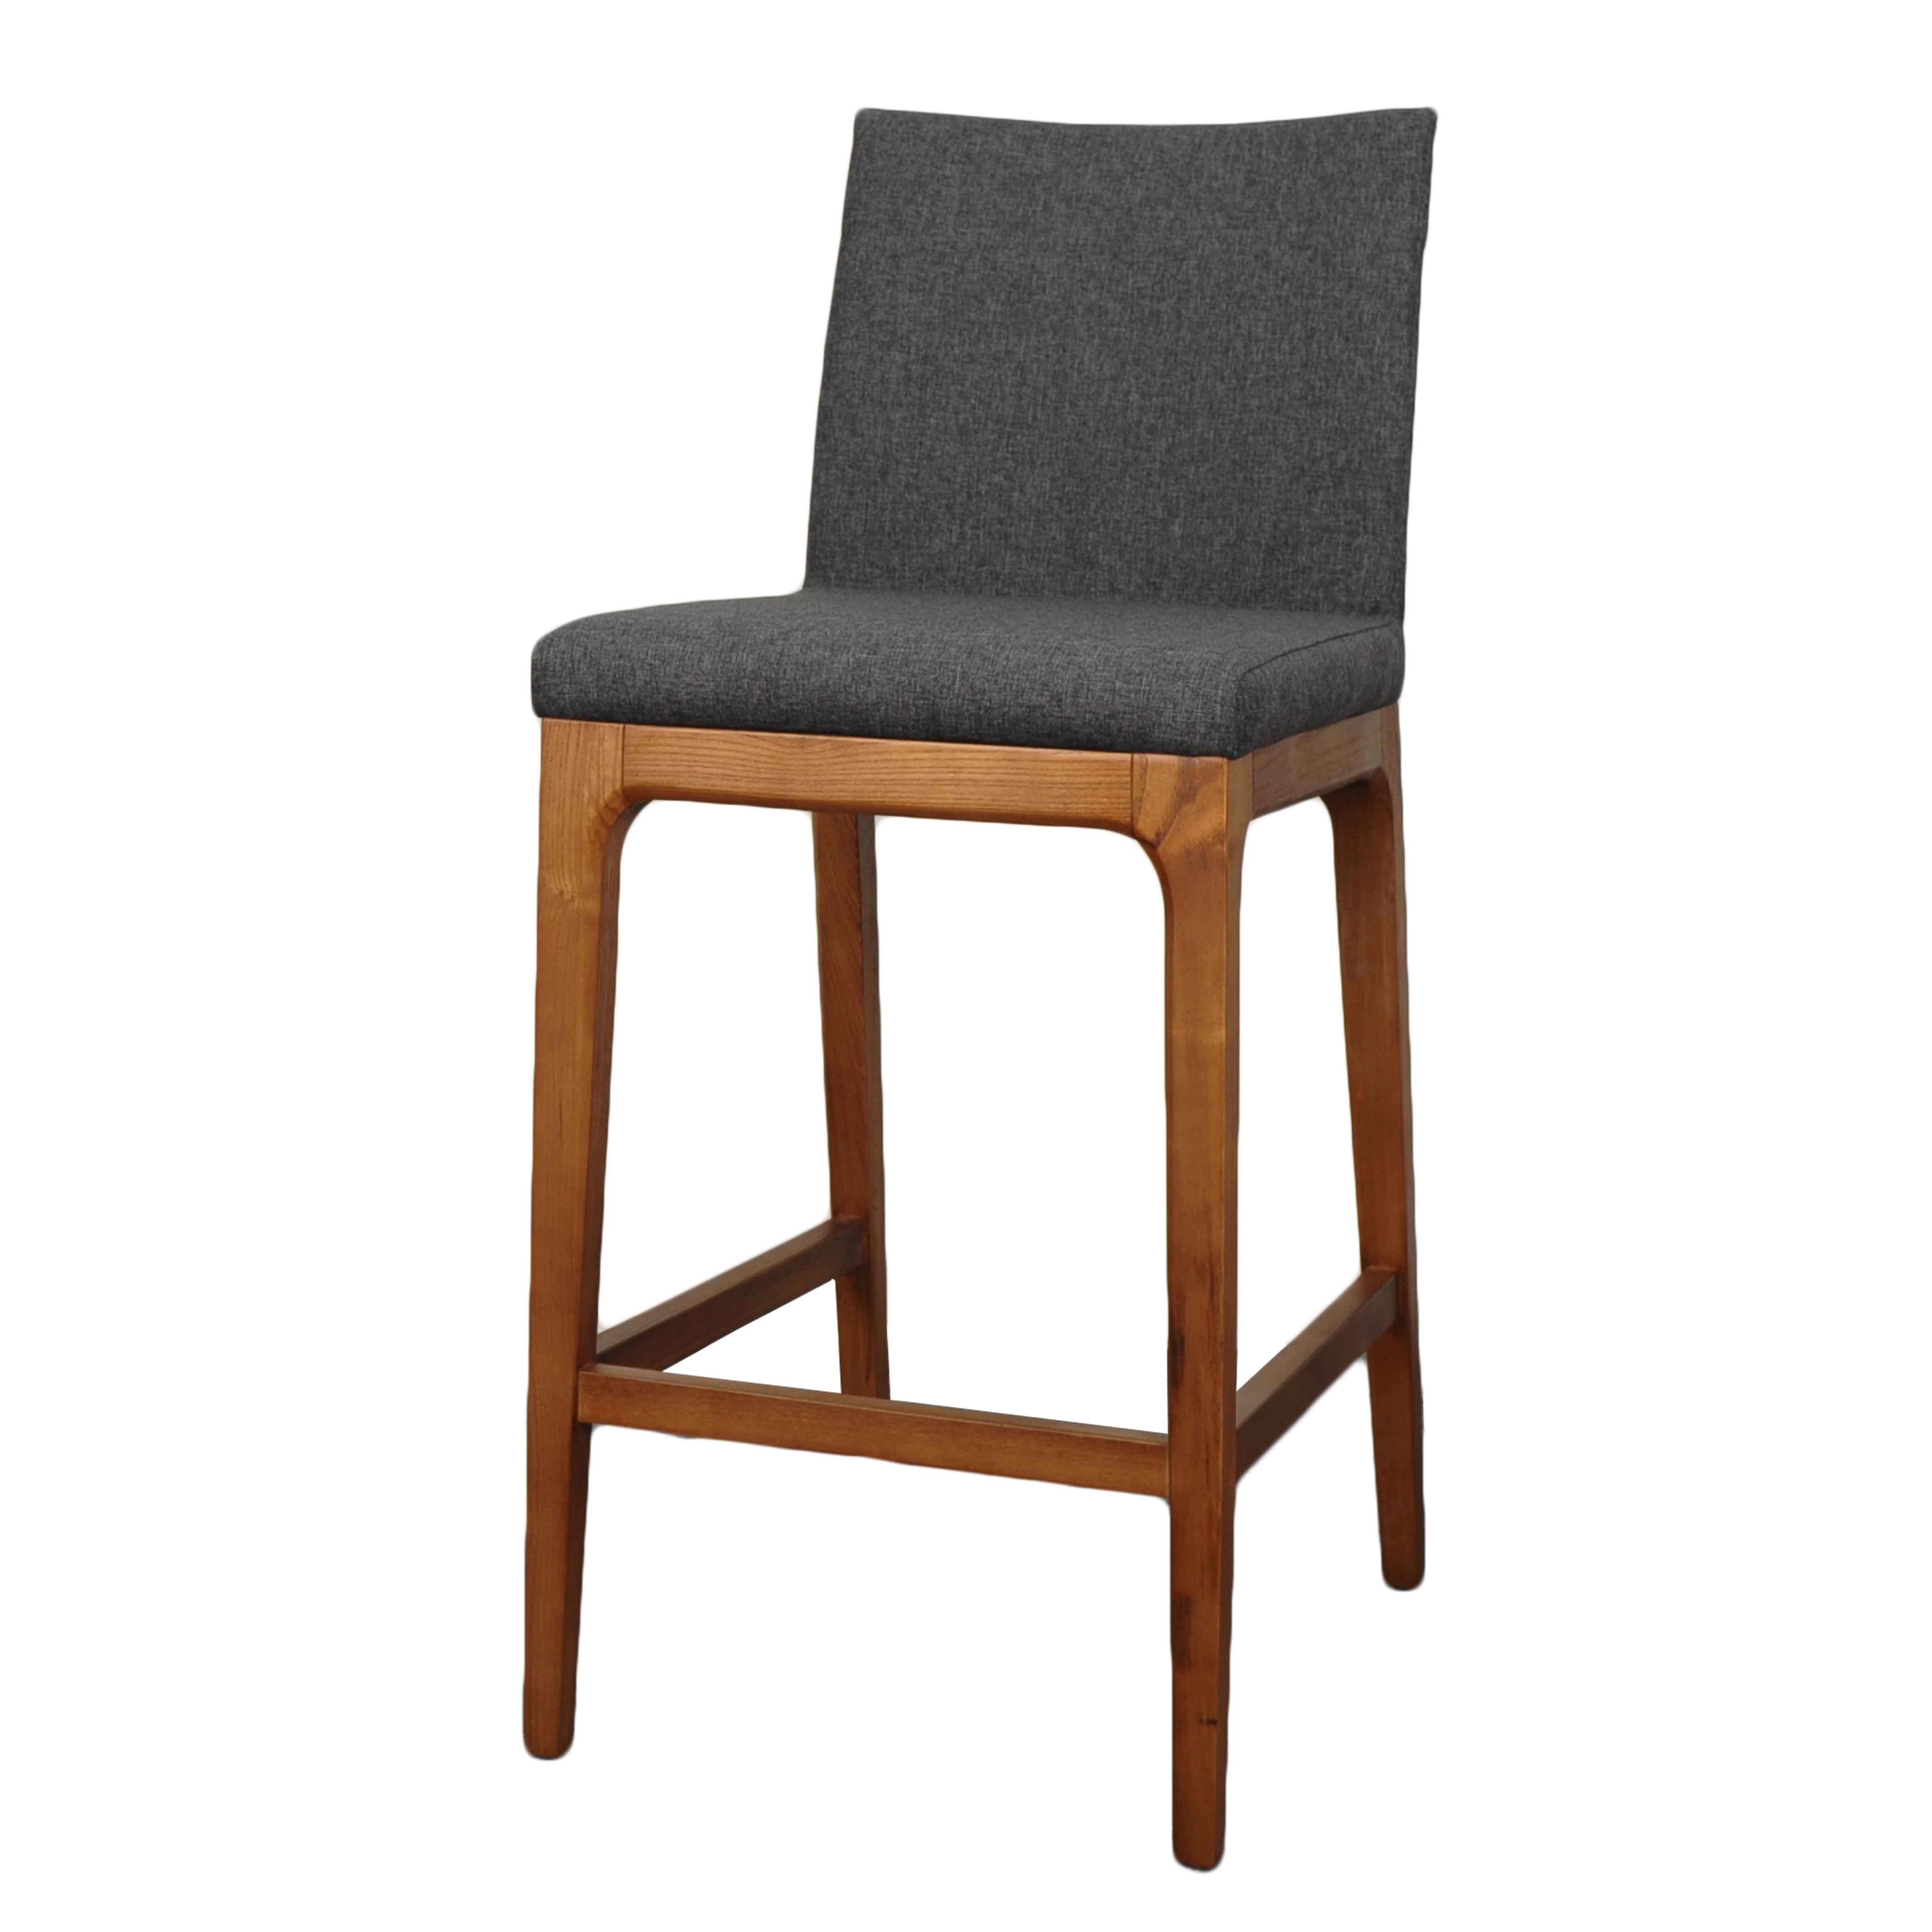 4400013 Ns Npd Furniture Stylish Amp Affordable